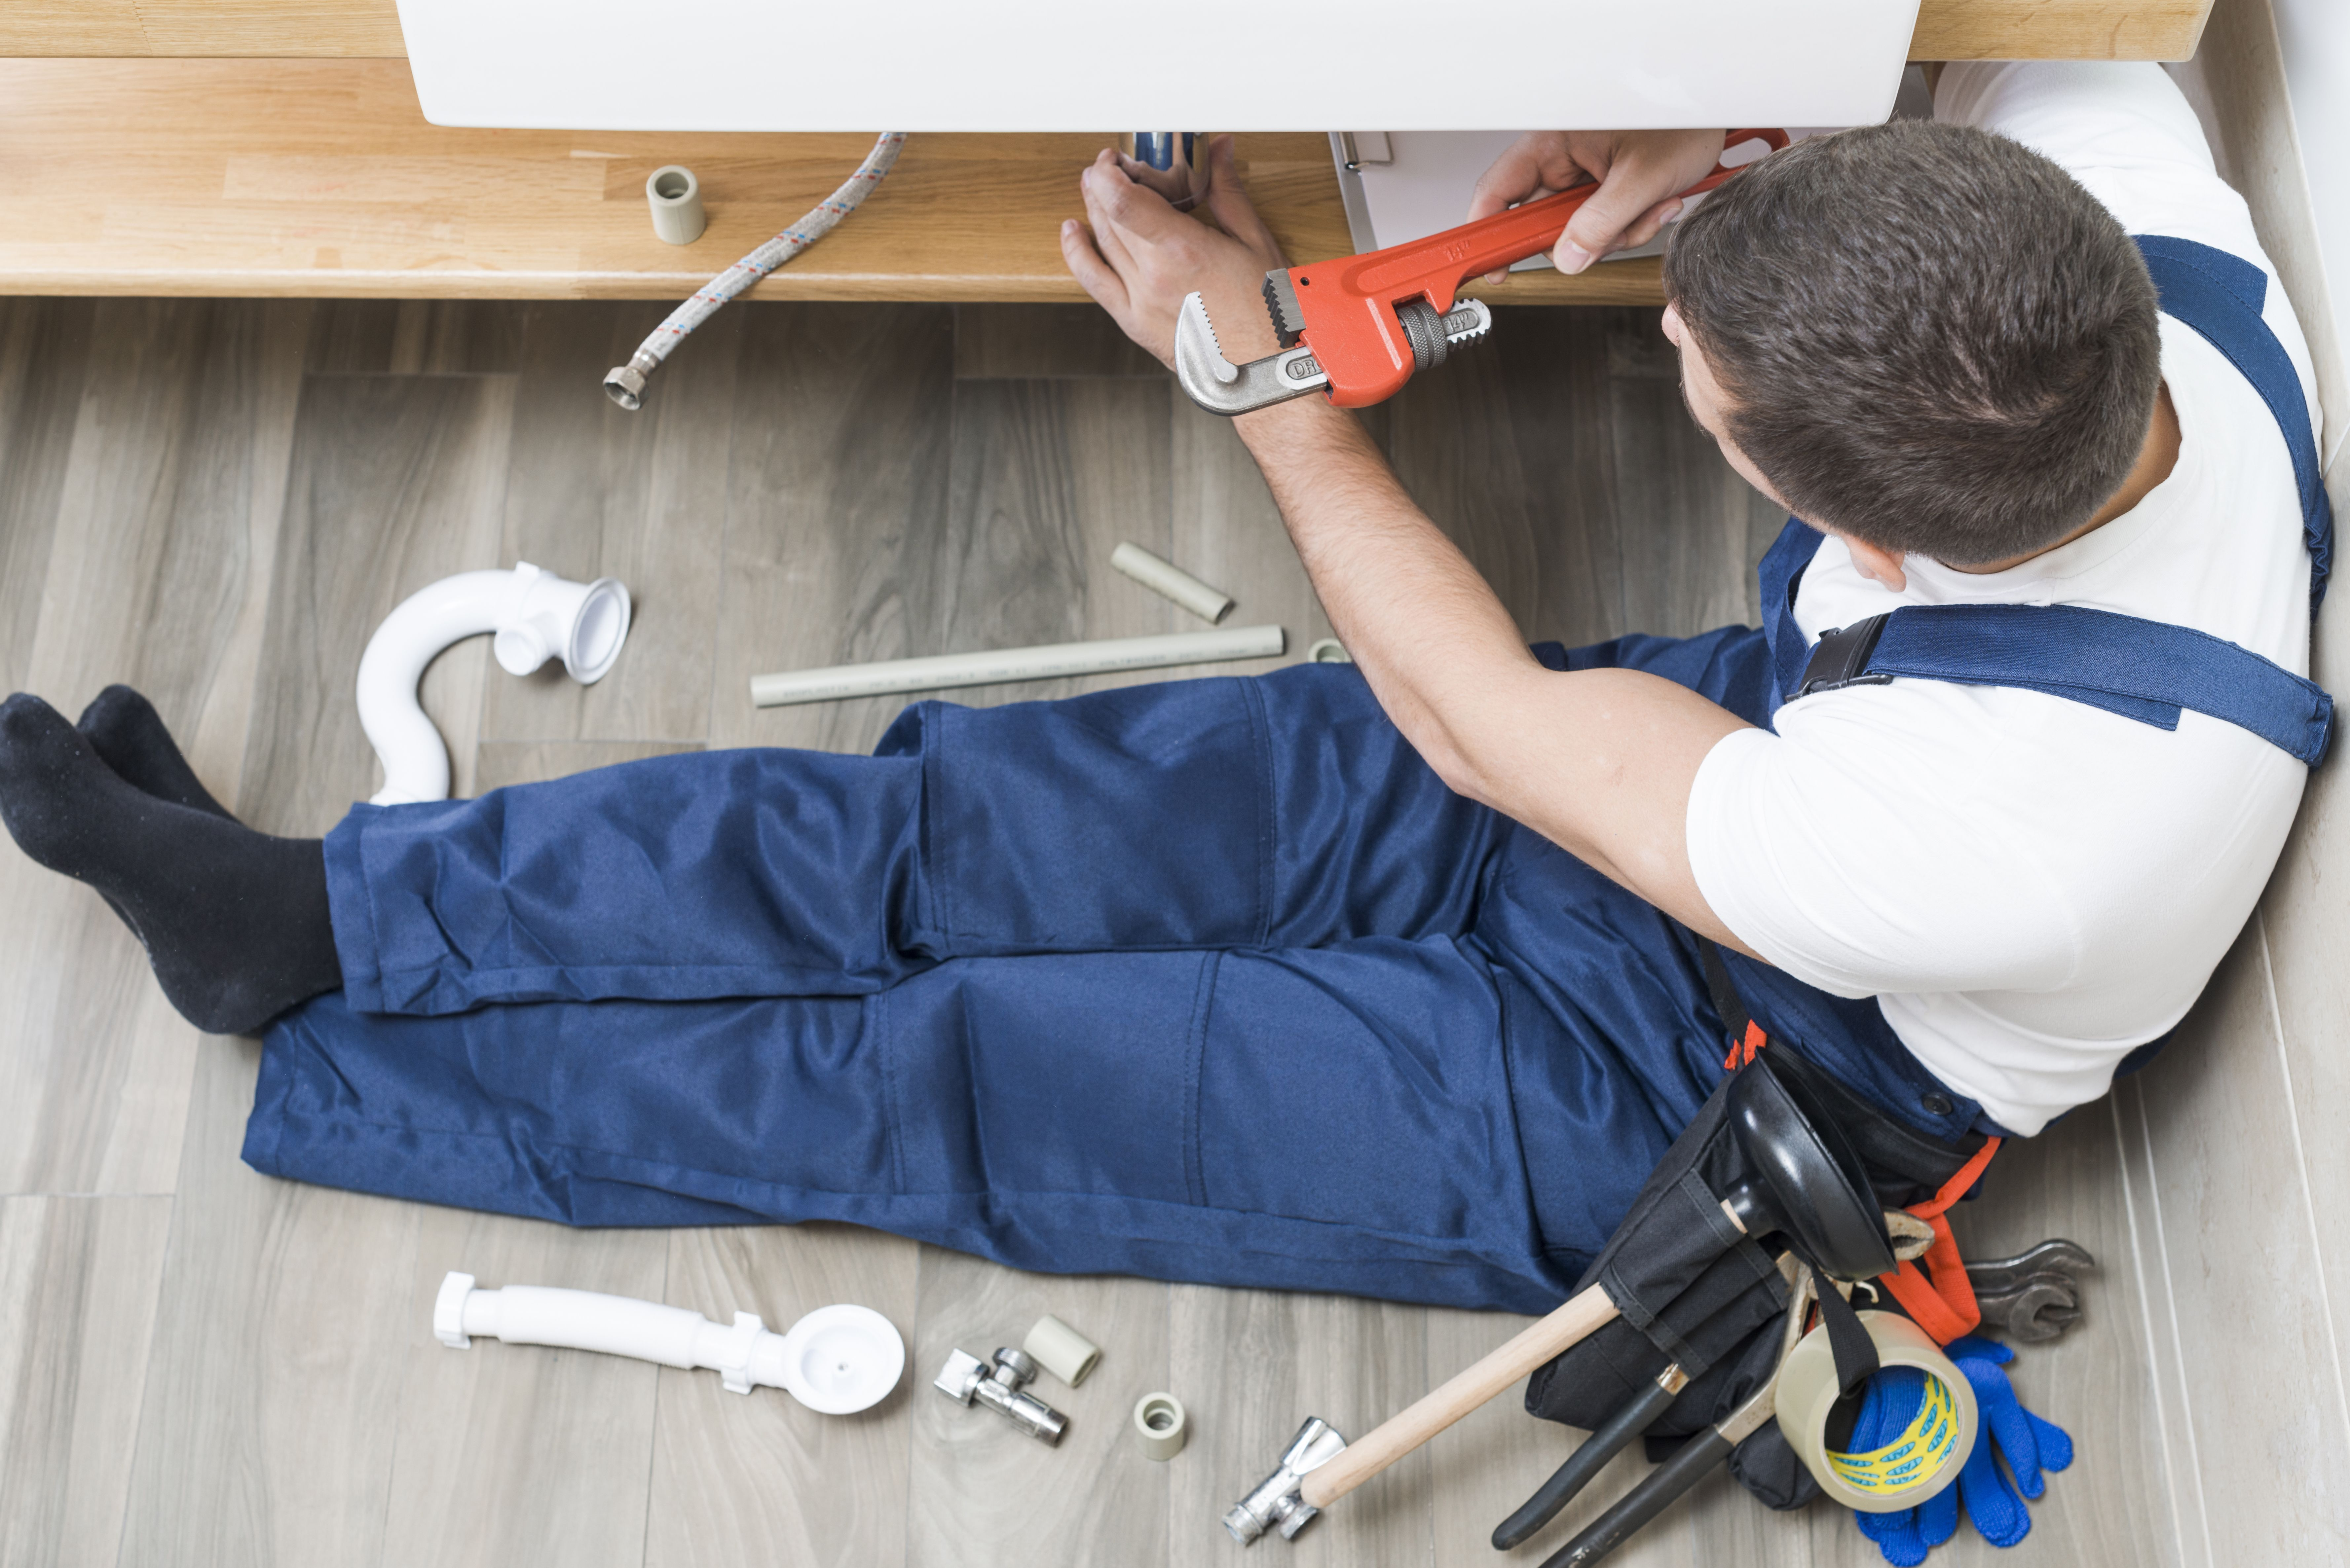 fieldservicemanagemen plumbing electrical